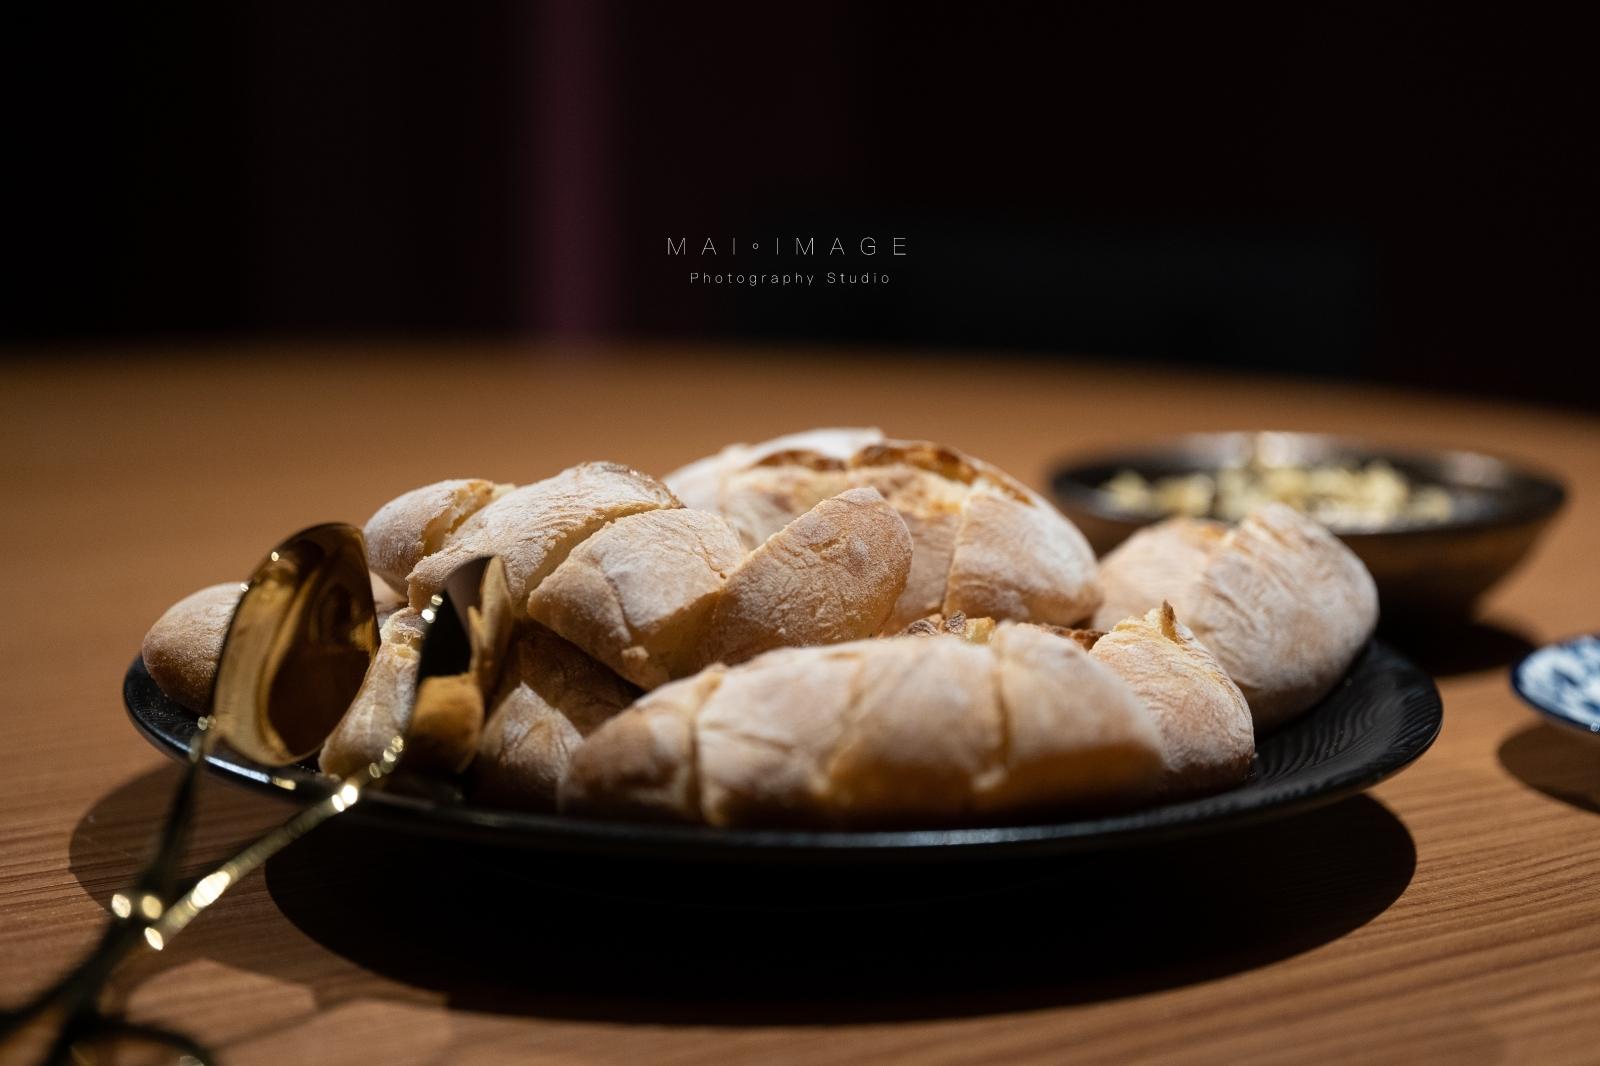 L.C Française法租界|台北東區最值得期待的餐酒館推新菜了~天冷了!來碗法式鎮店雞湯吧。雞湯2.0版三種口味道道誘人,5J火腿直接入湯|台北餐酒推薦